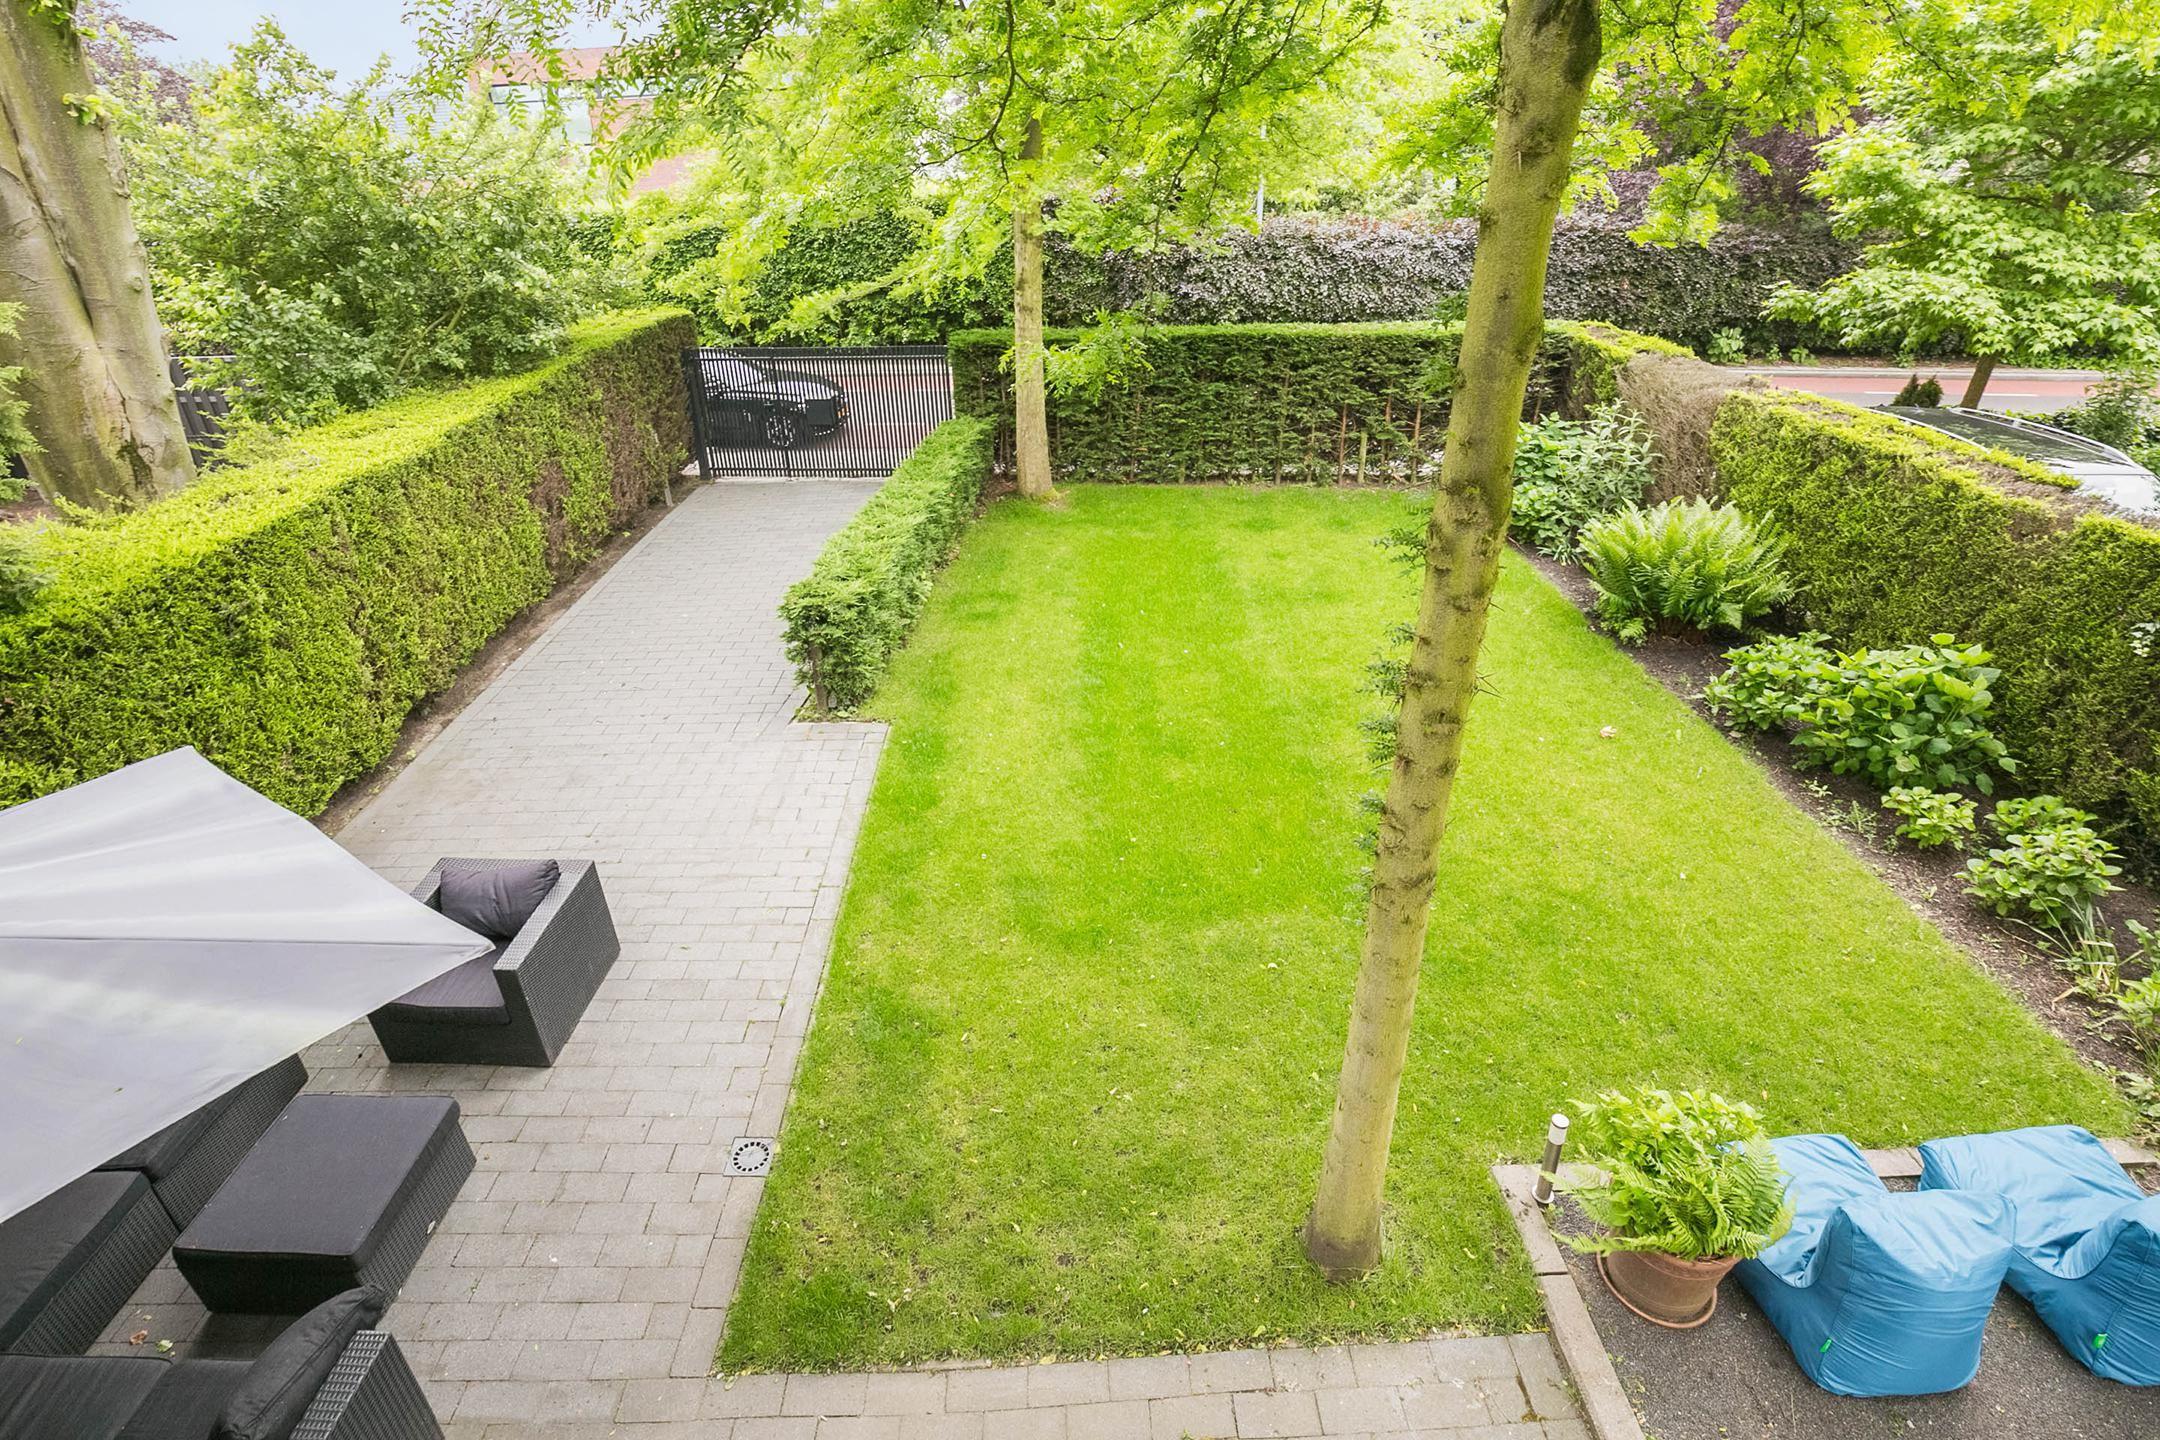 Huis te koop: Werkersdijk 18 a 3161 BN Rhoon [funda]